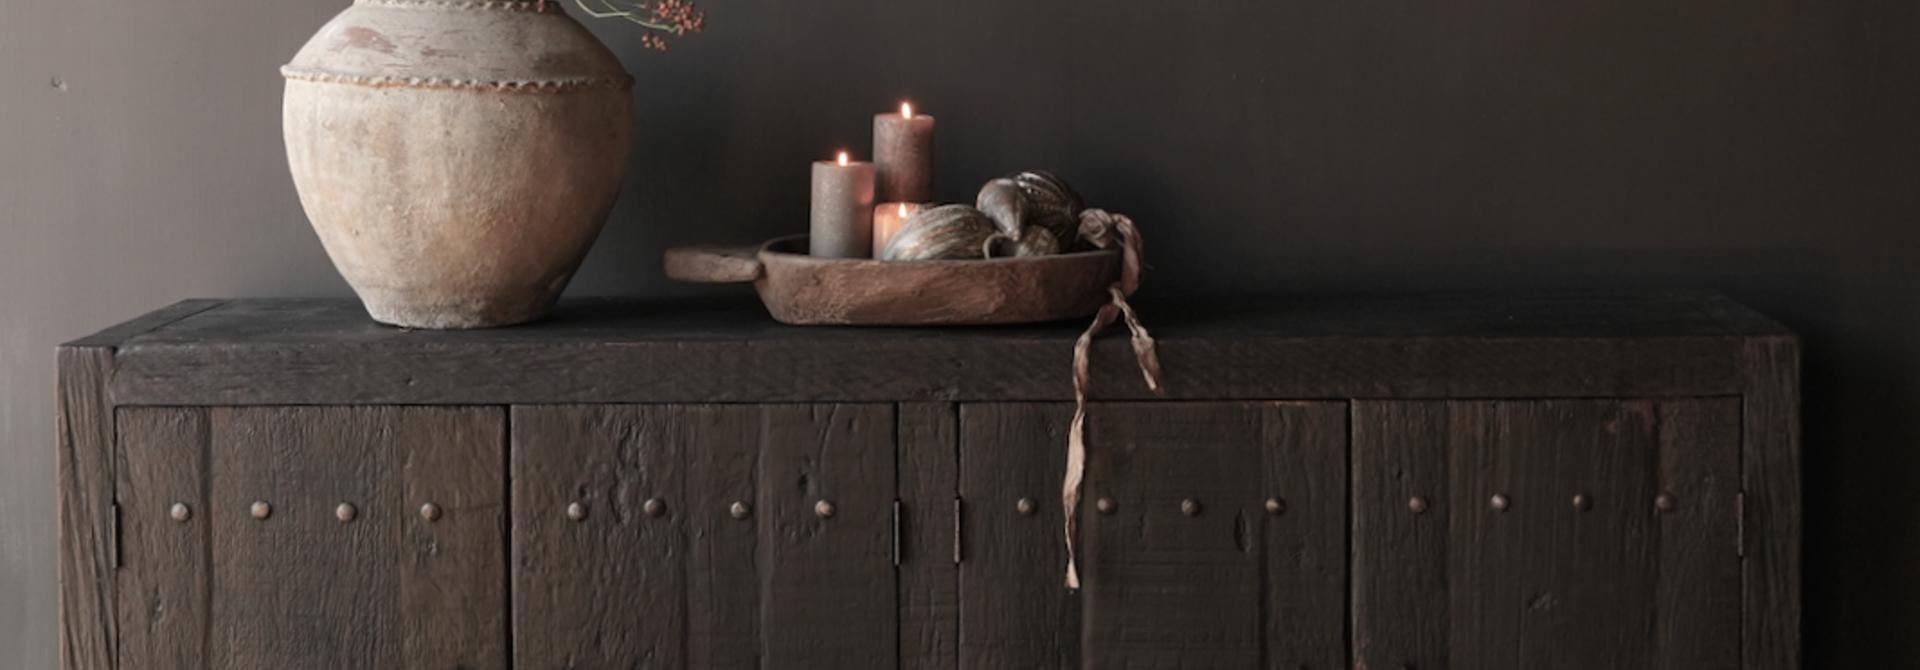 TV-Schrank / Sideboard aus altem schwarz / braunem robustem Holz